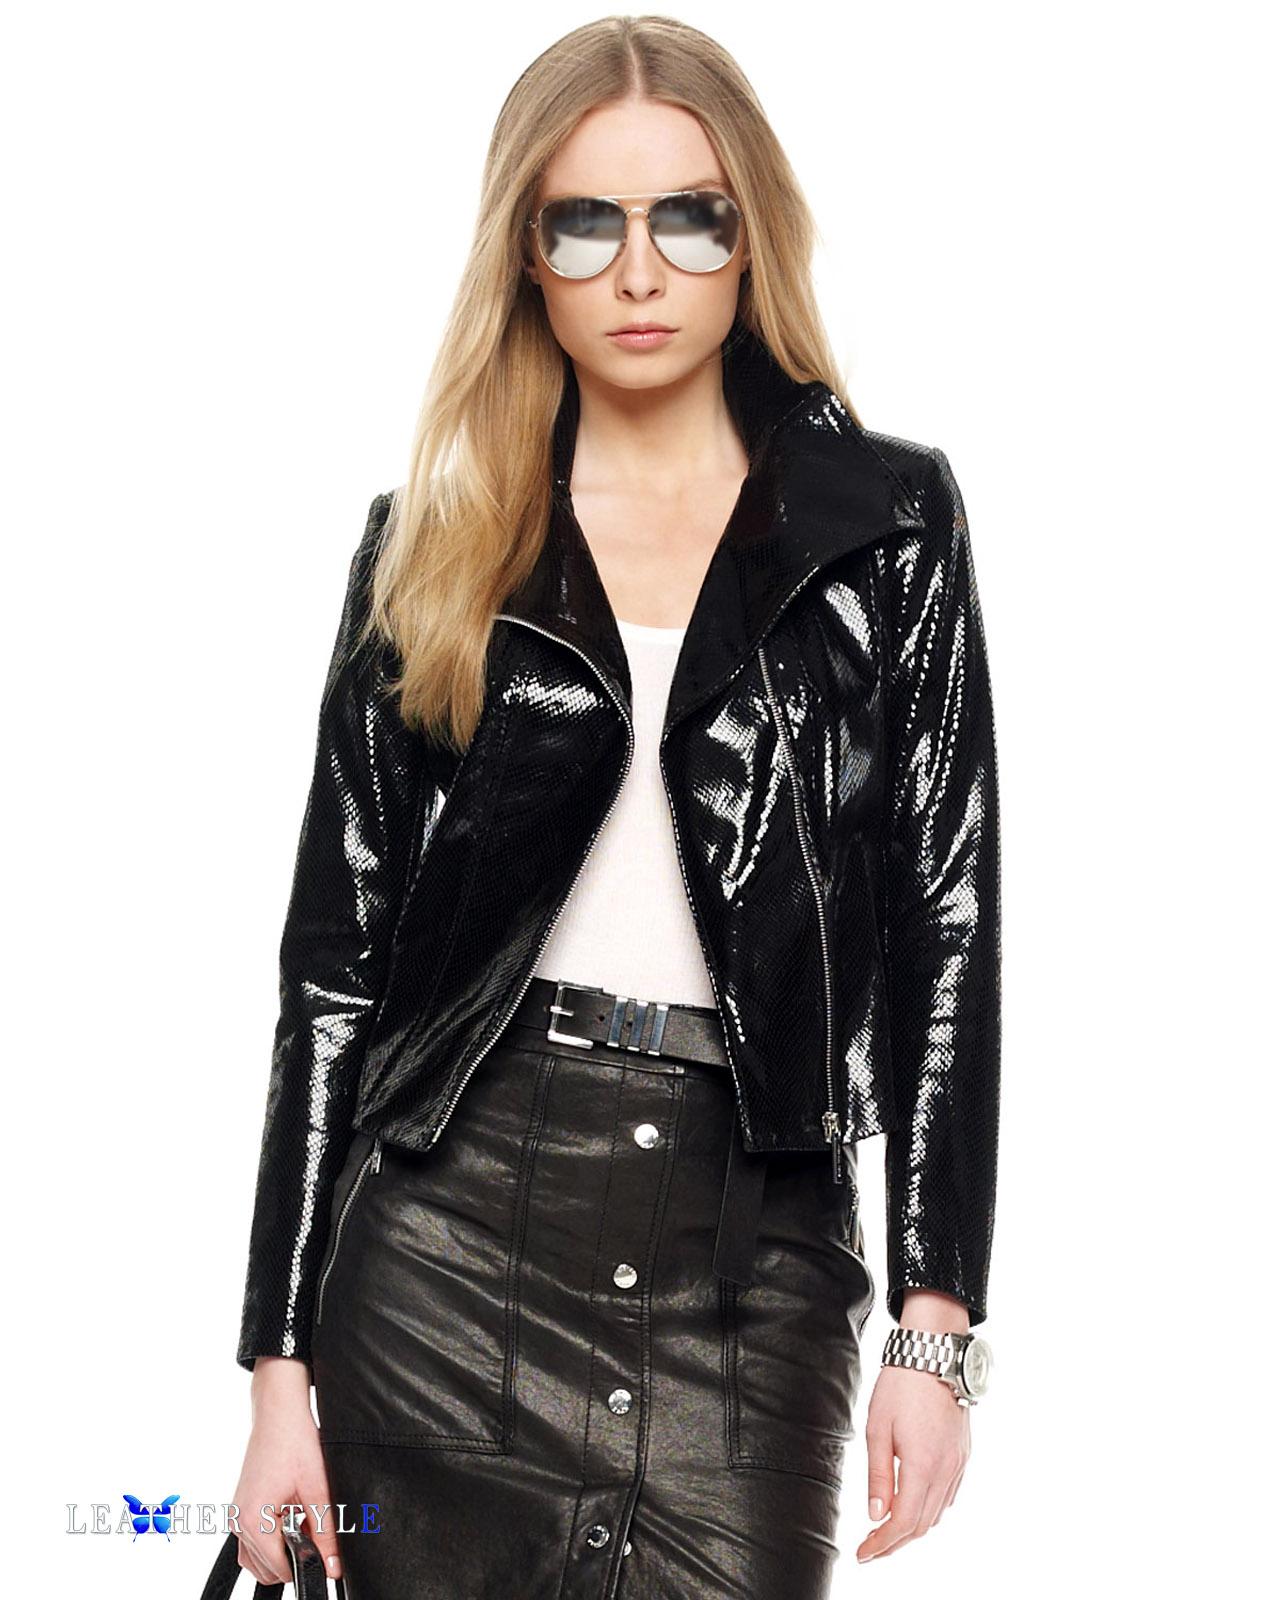 Michael Kors Jackets For Women